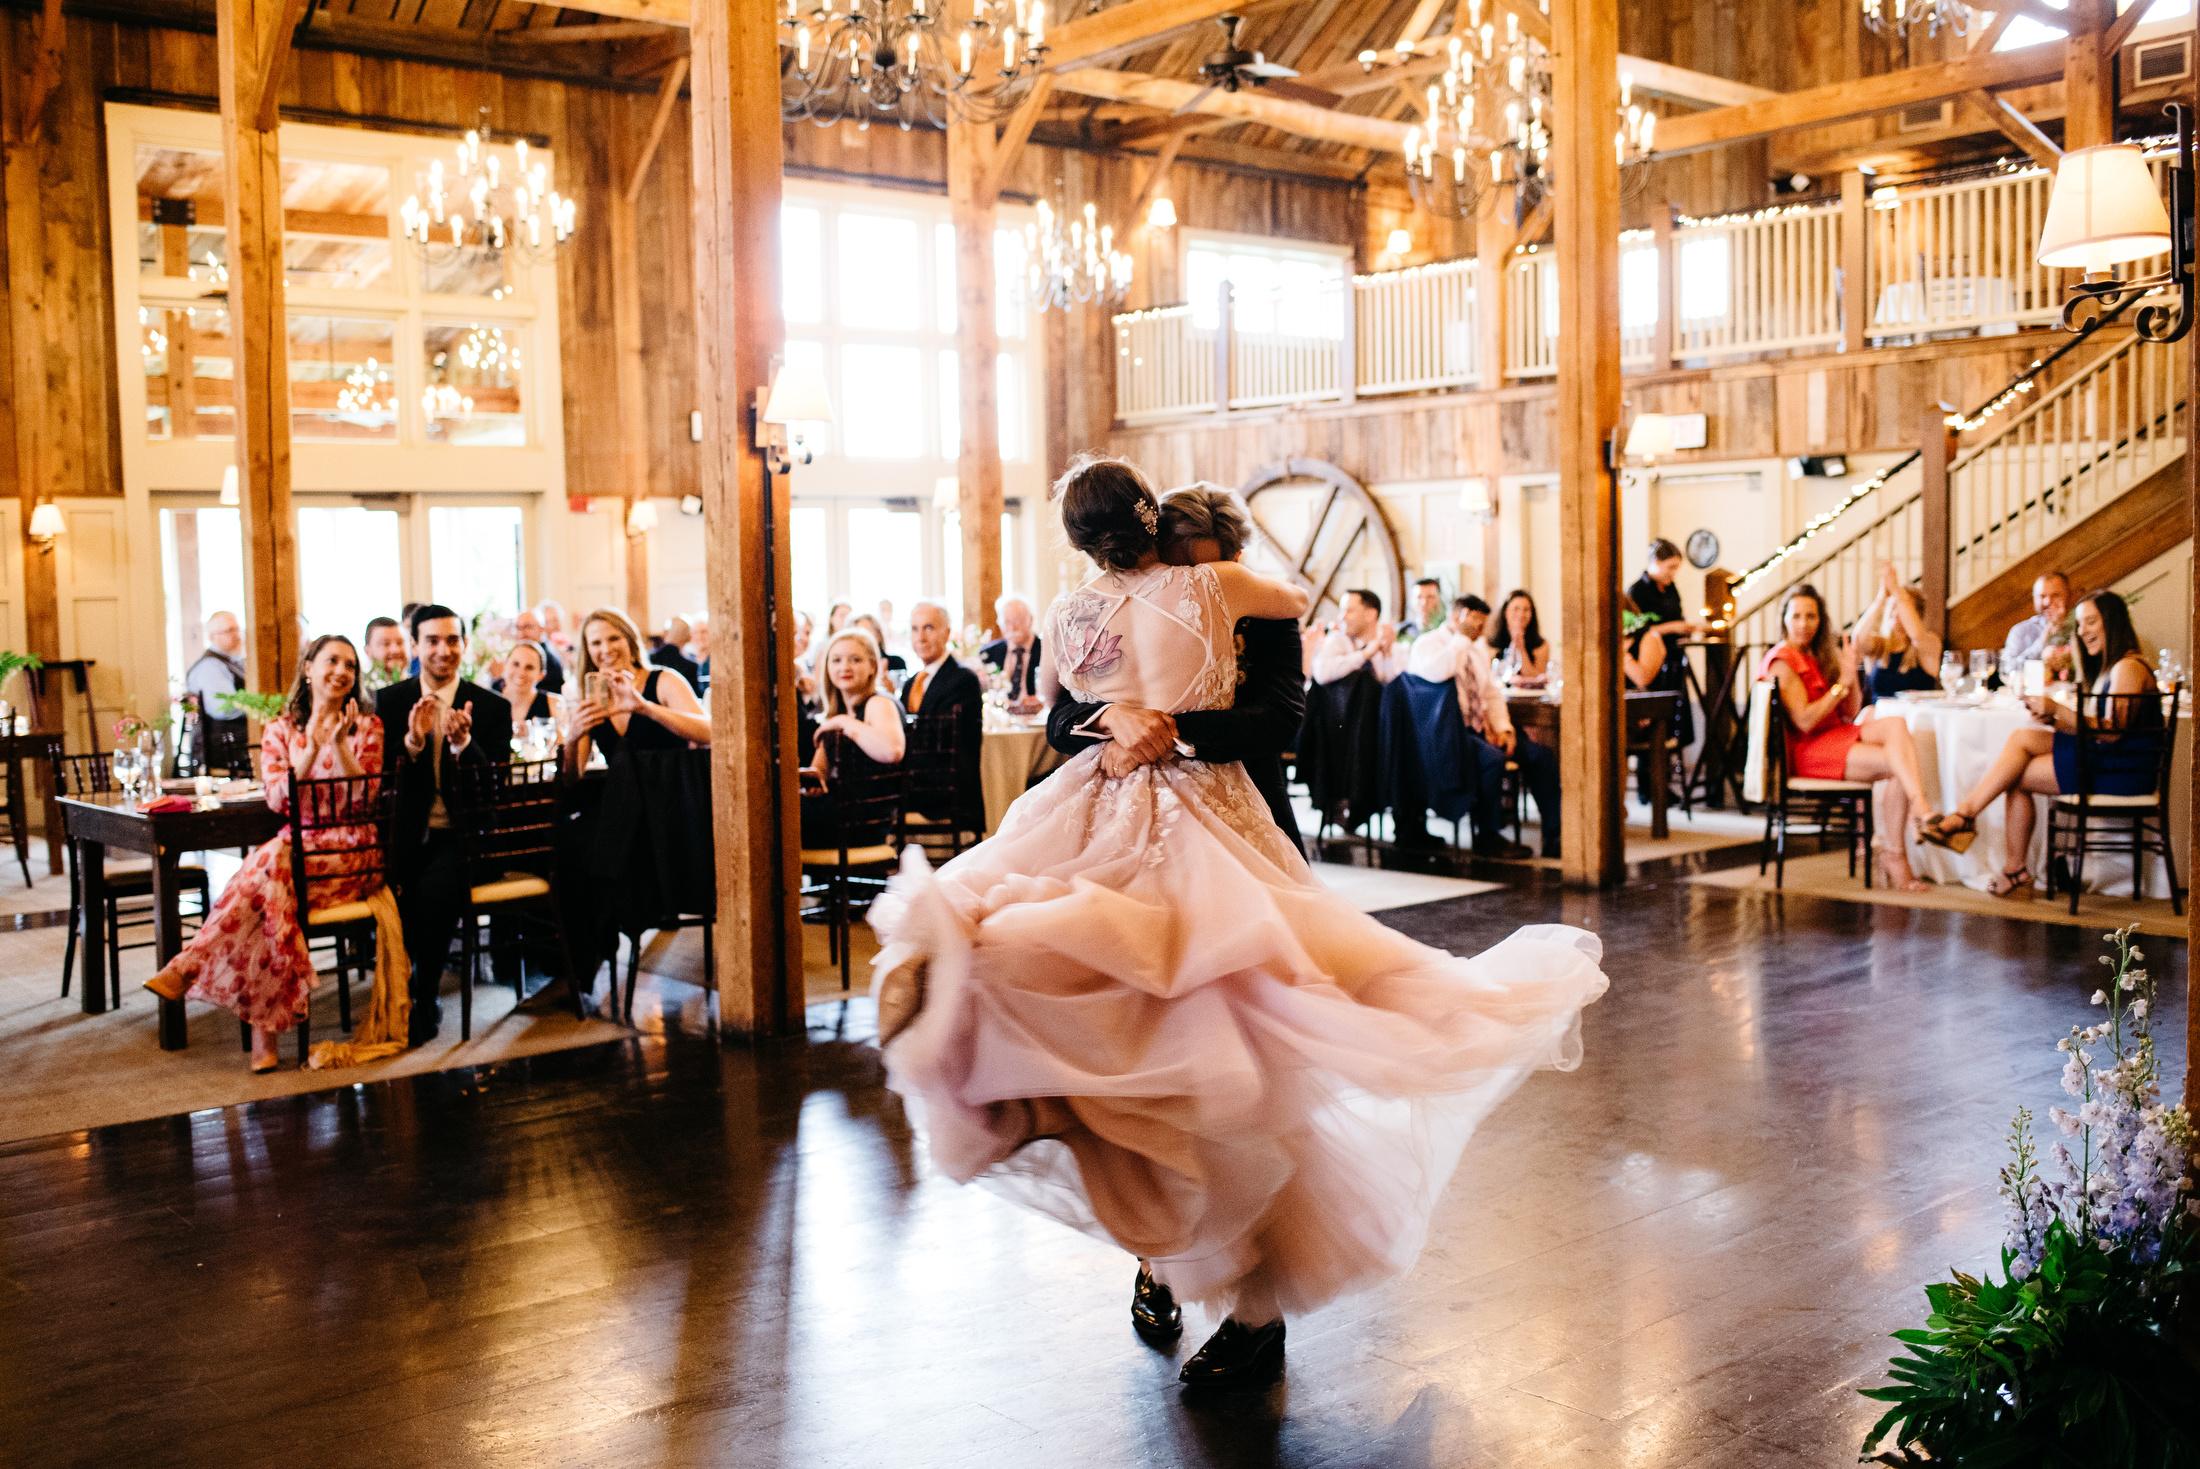 gibbet_hill_barn_same_sex_wedding_photos_56.JPG